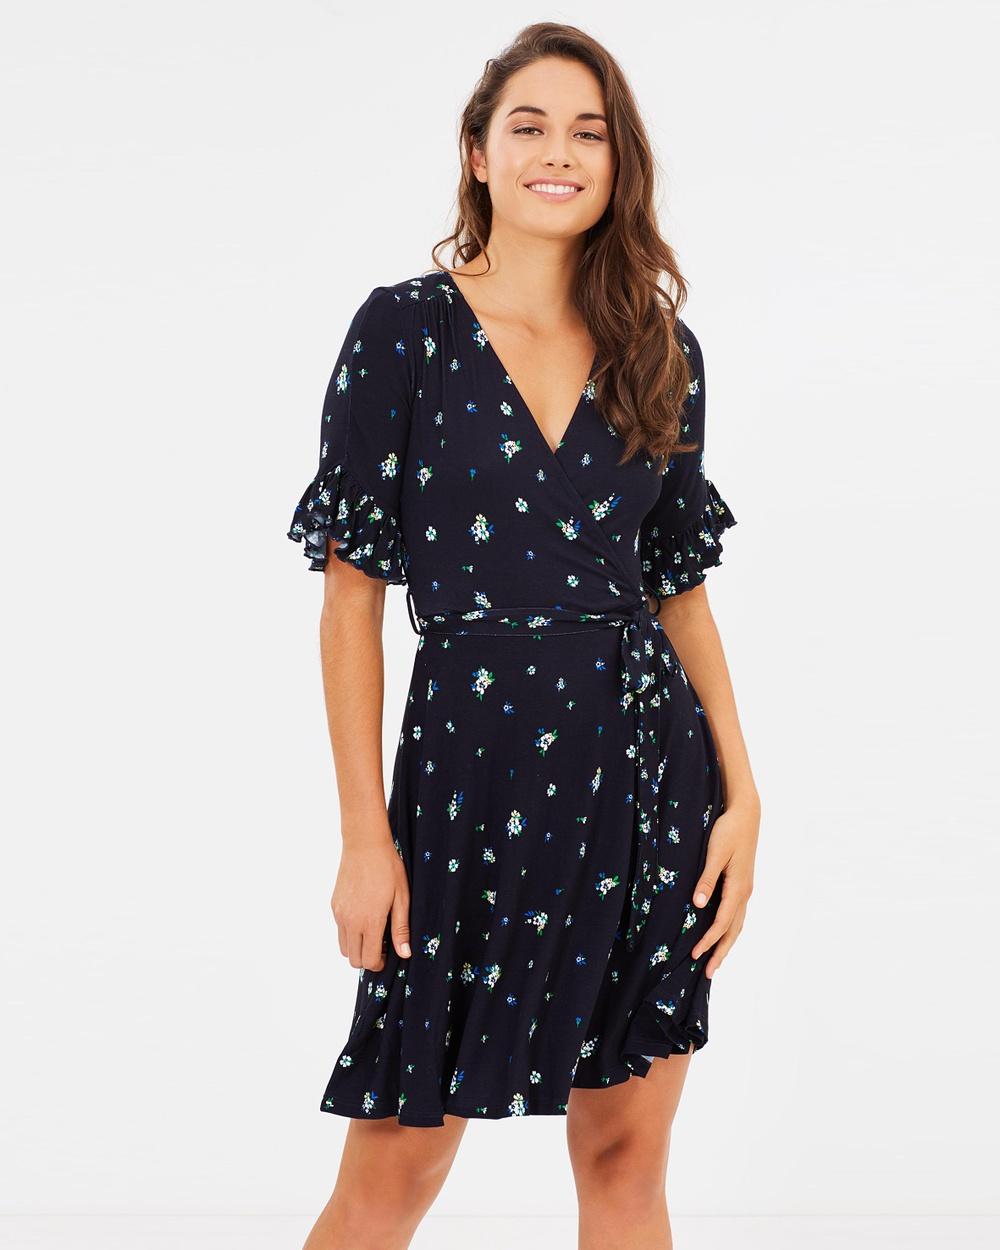 Dorothy Perkins Floral Wrap Dress Printed Dresses Navy Floral Wrap Dress